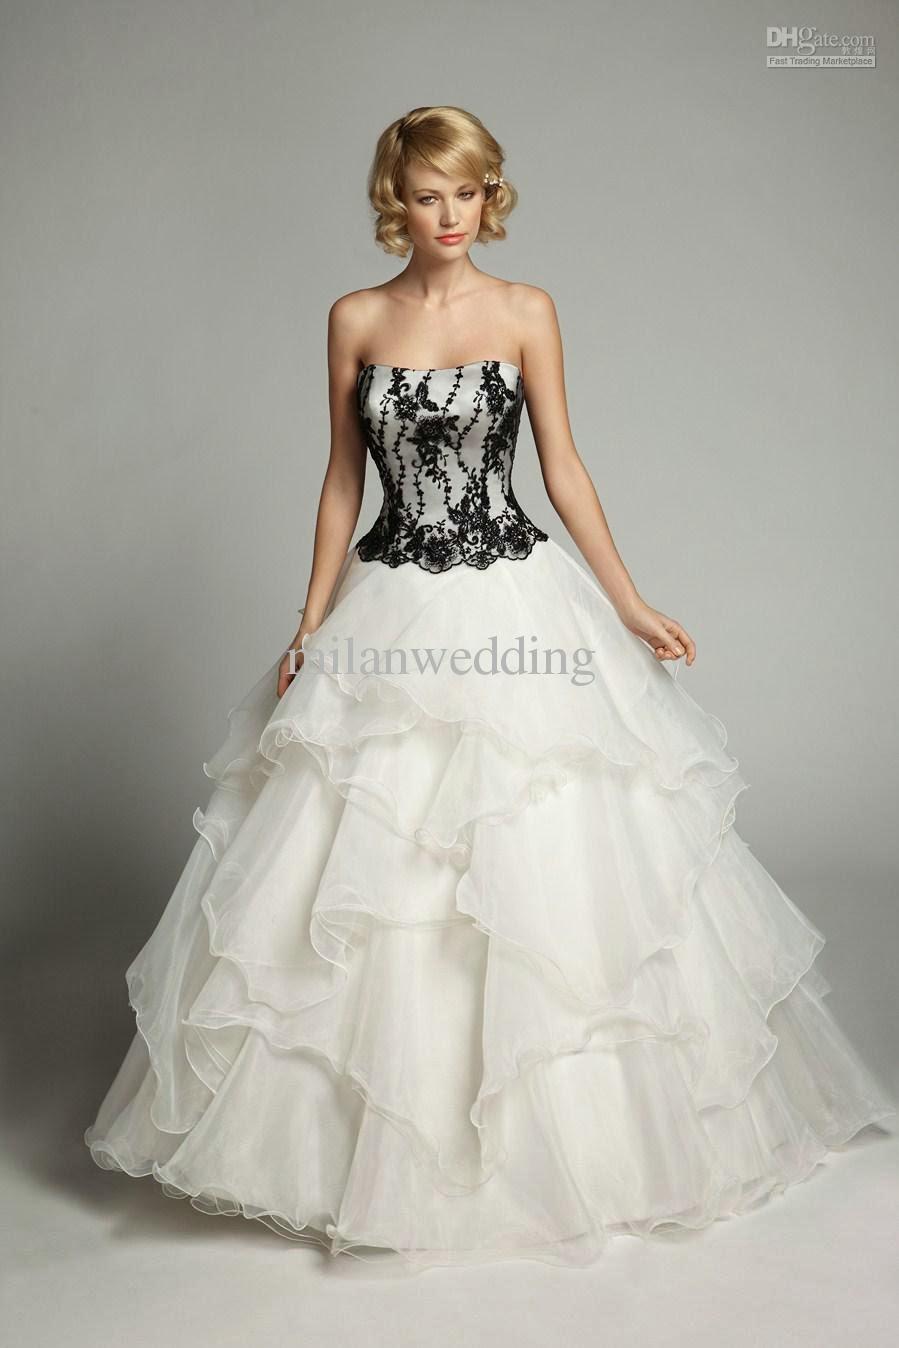 85 Wedding Dress Color Poem Long Sleeves Lace Appliques Button